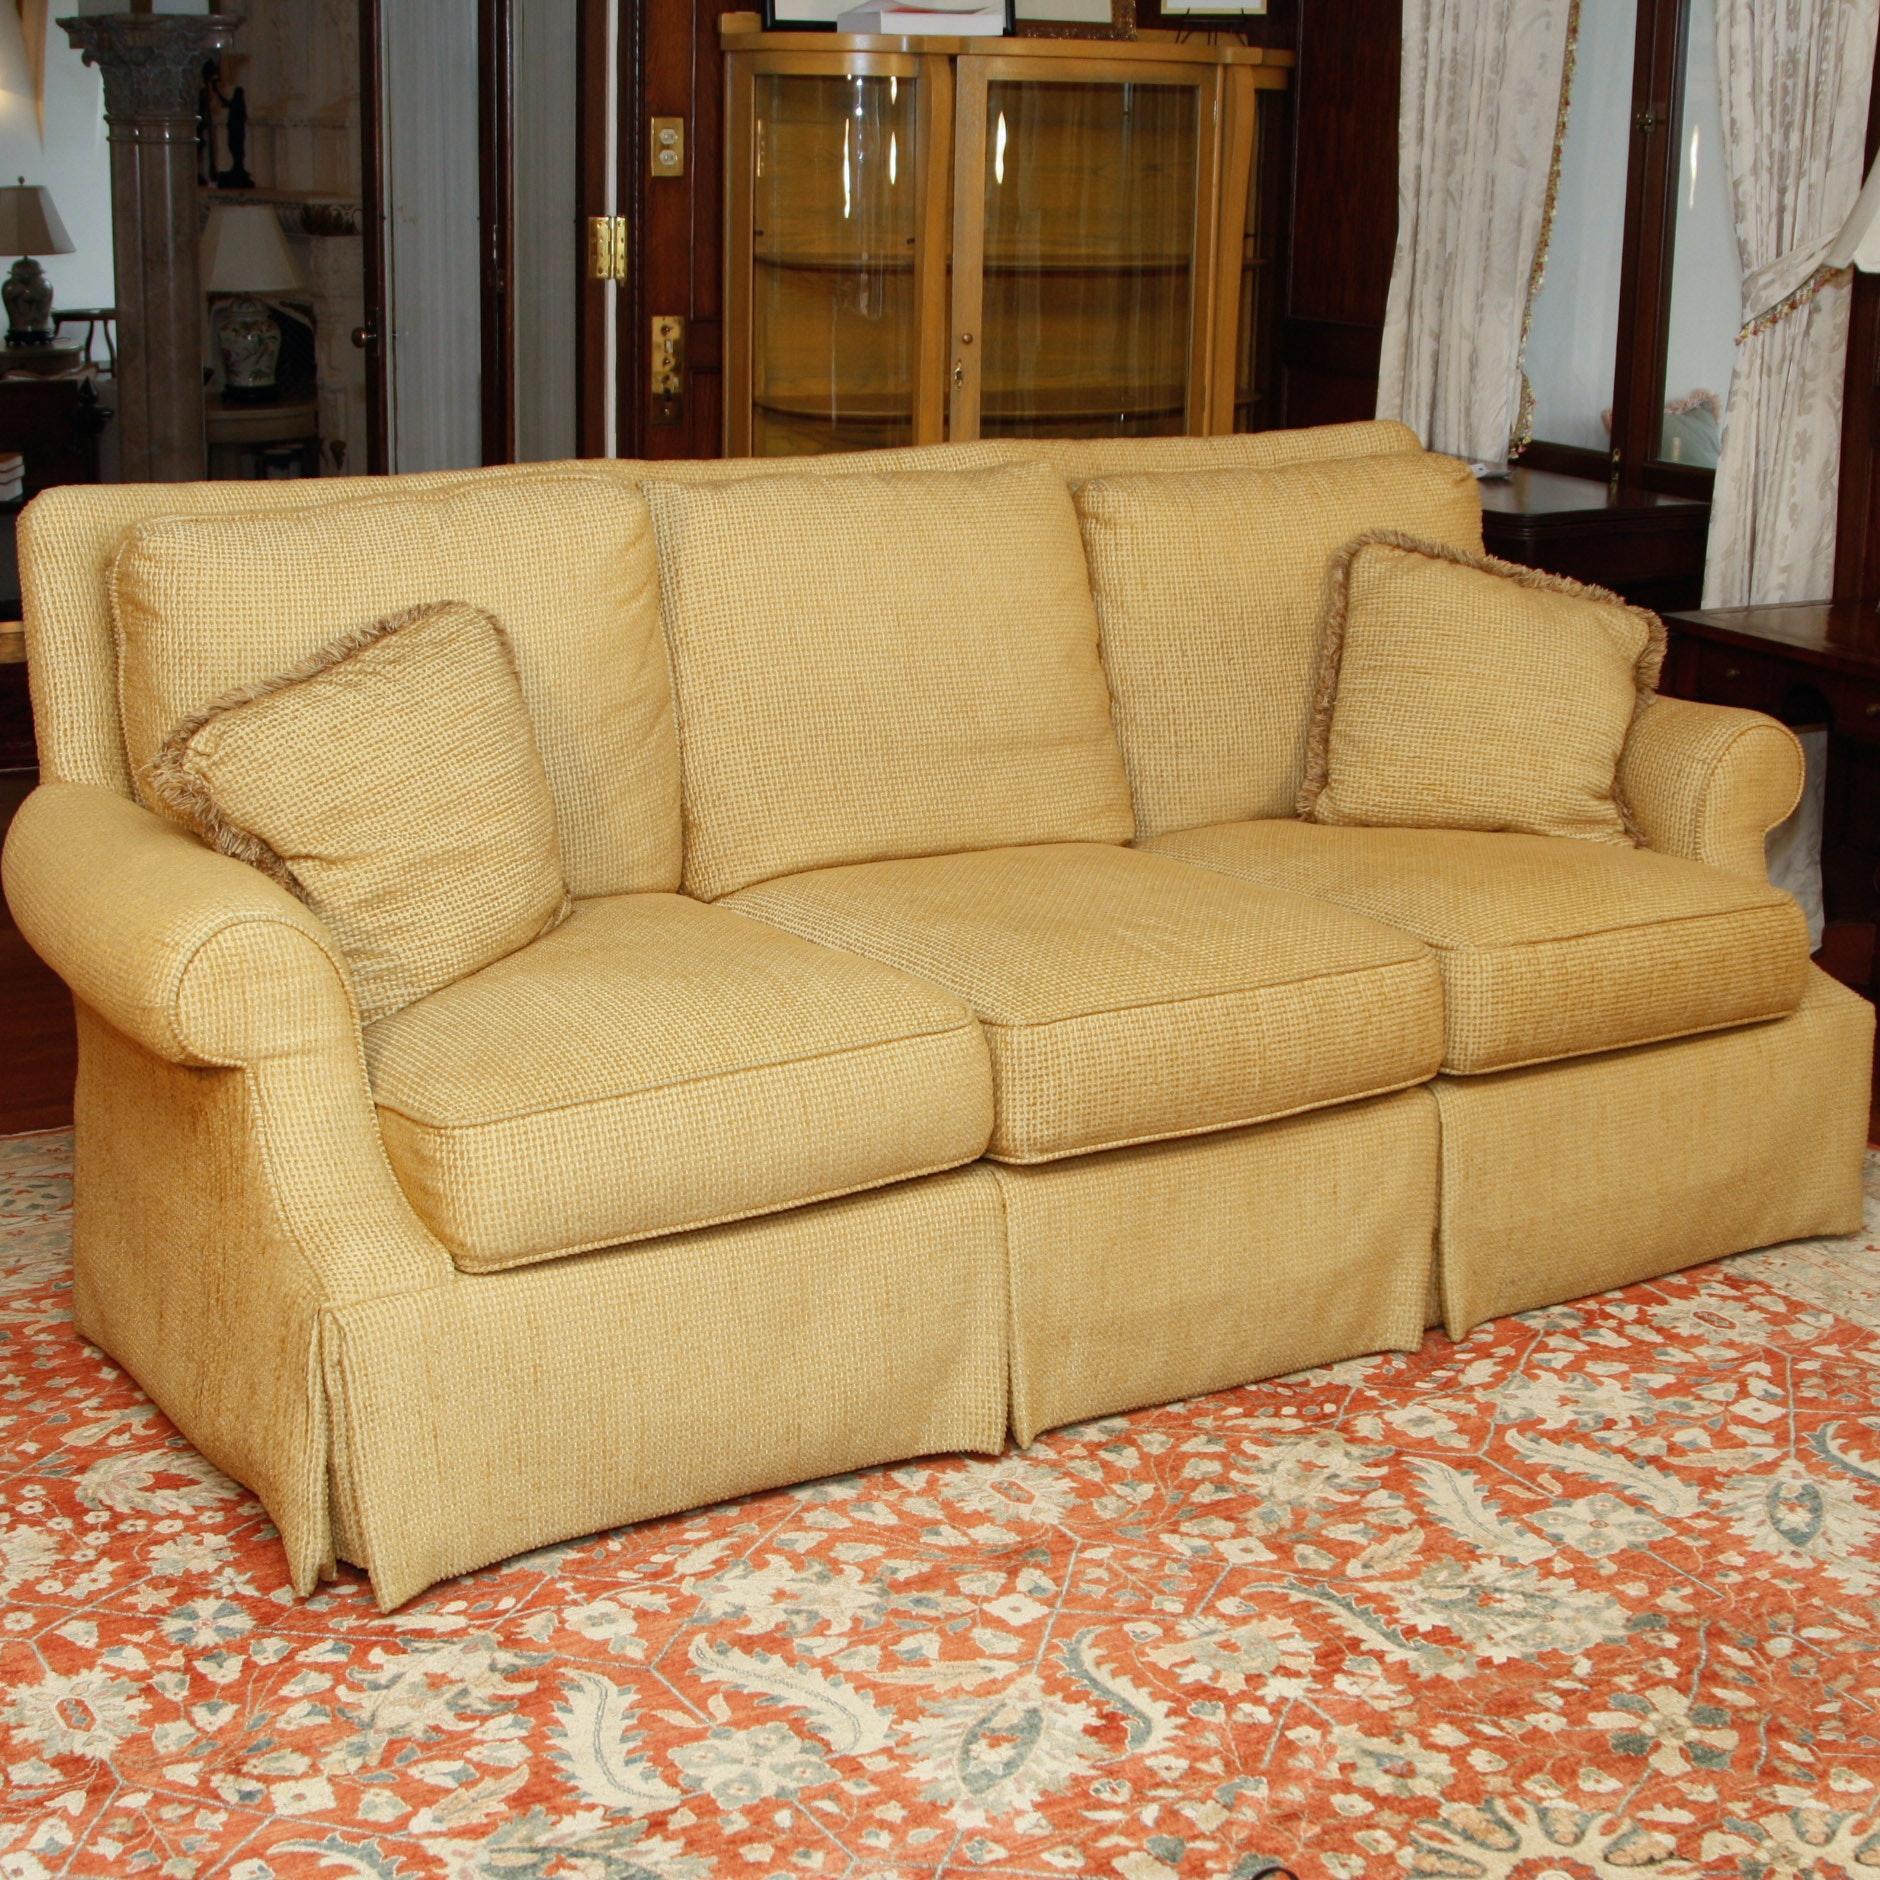 Ordinaire Ferguson Copeland Upholstered Sofa ...